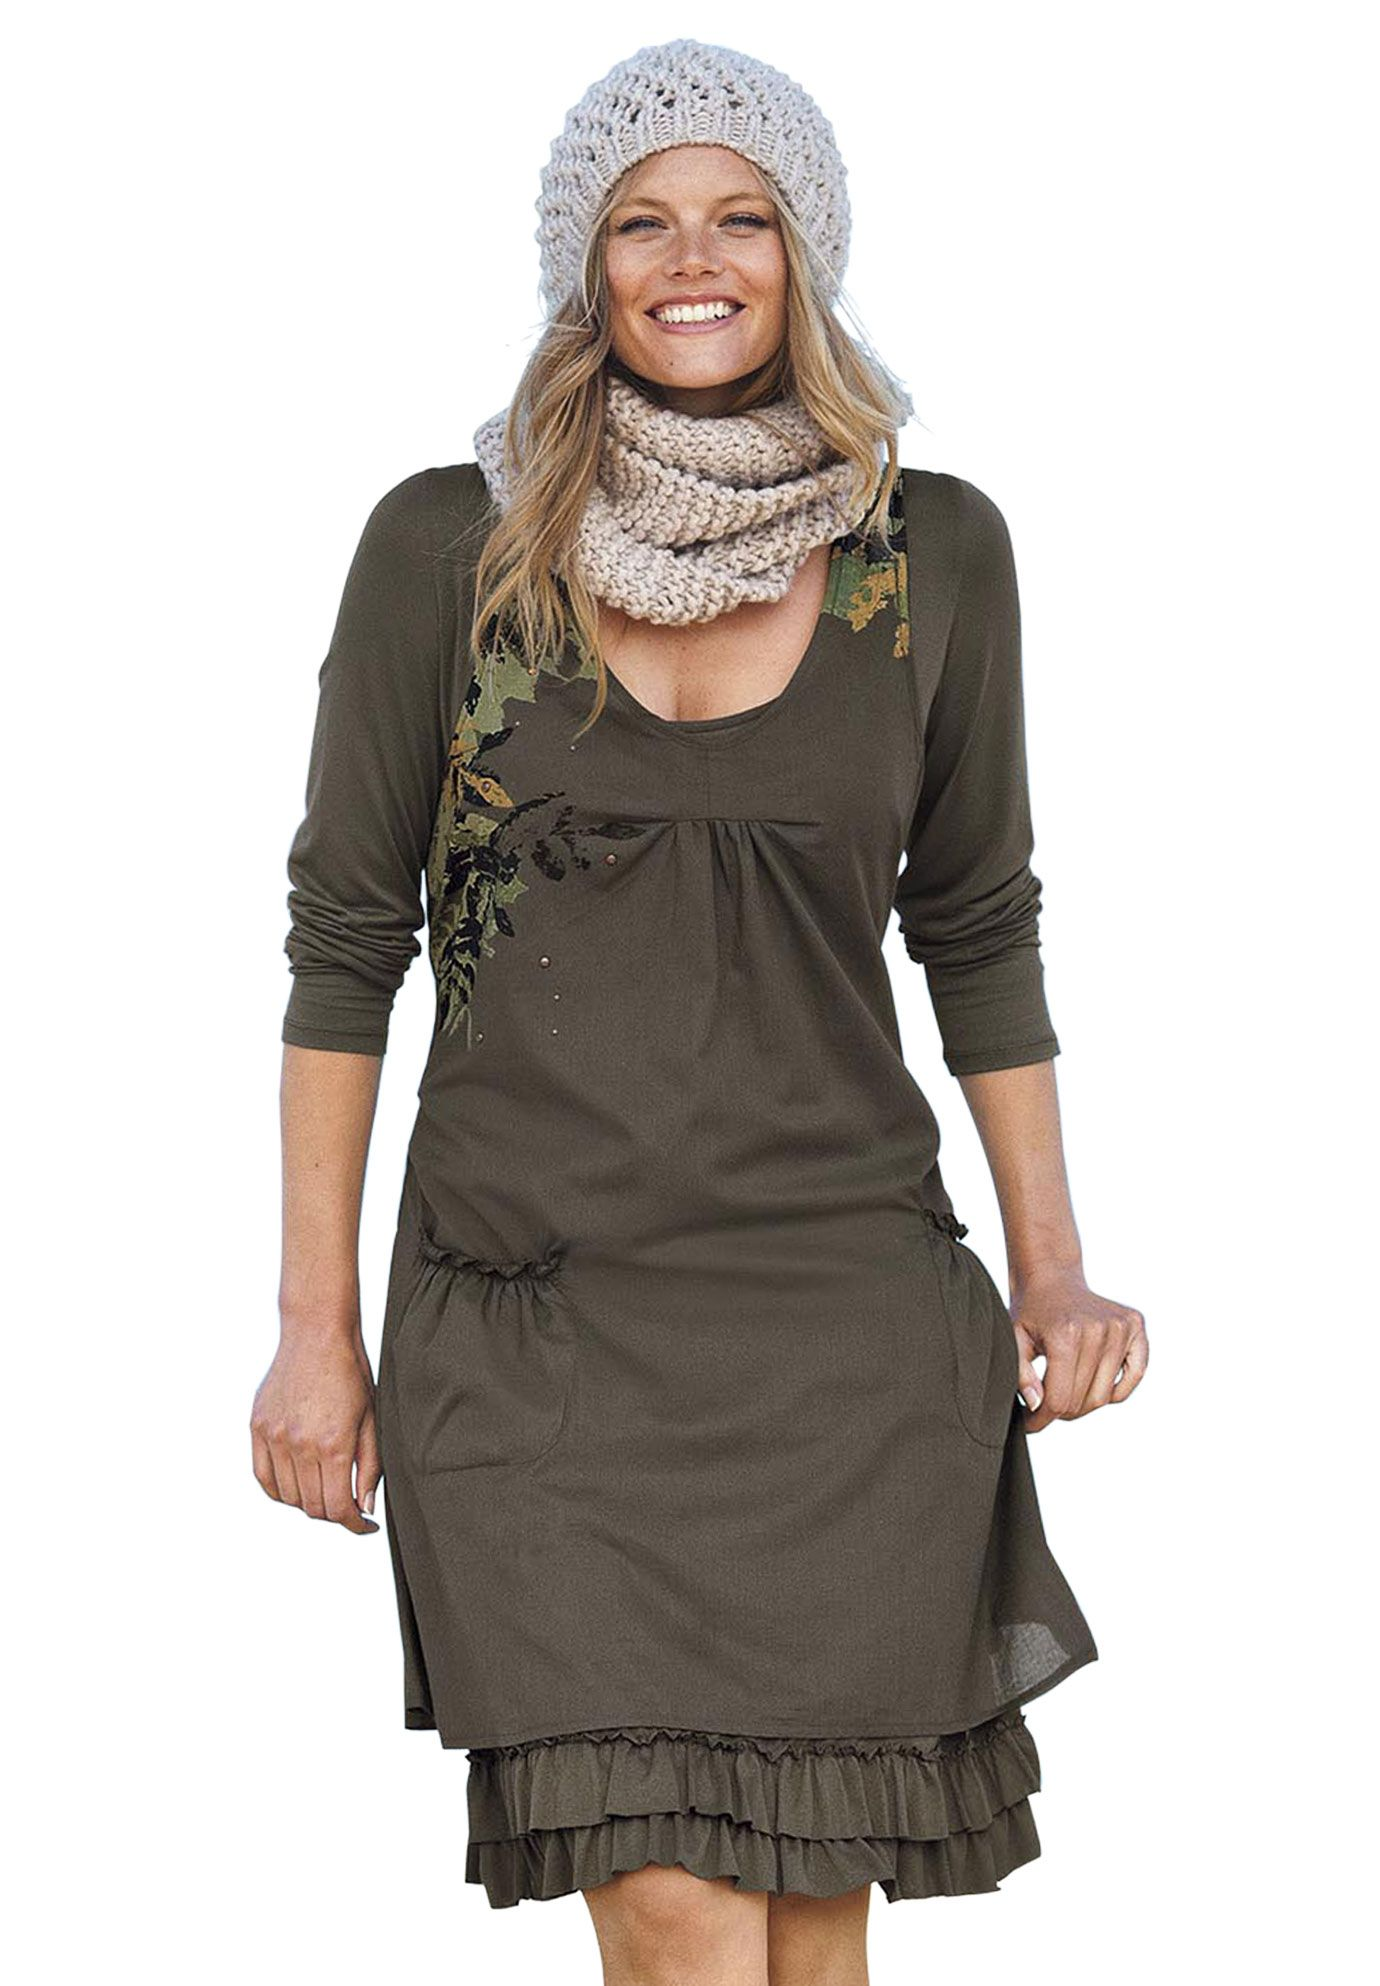 Plus Size Clothing Fashion For Plus Size Women At Roamans Its